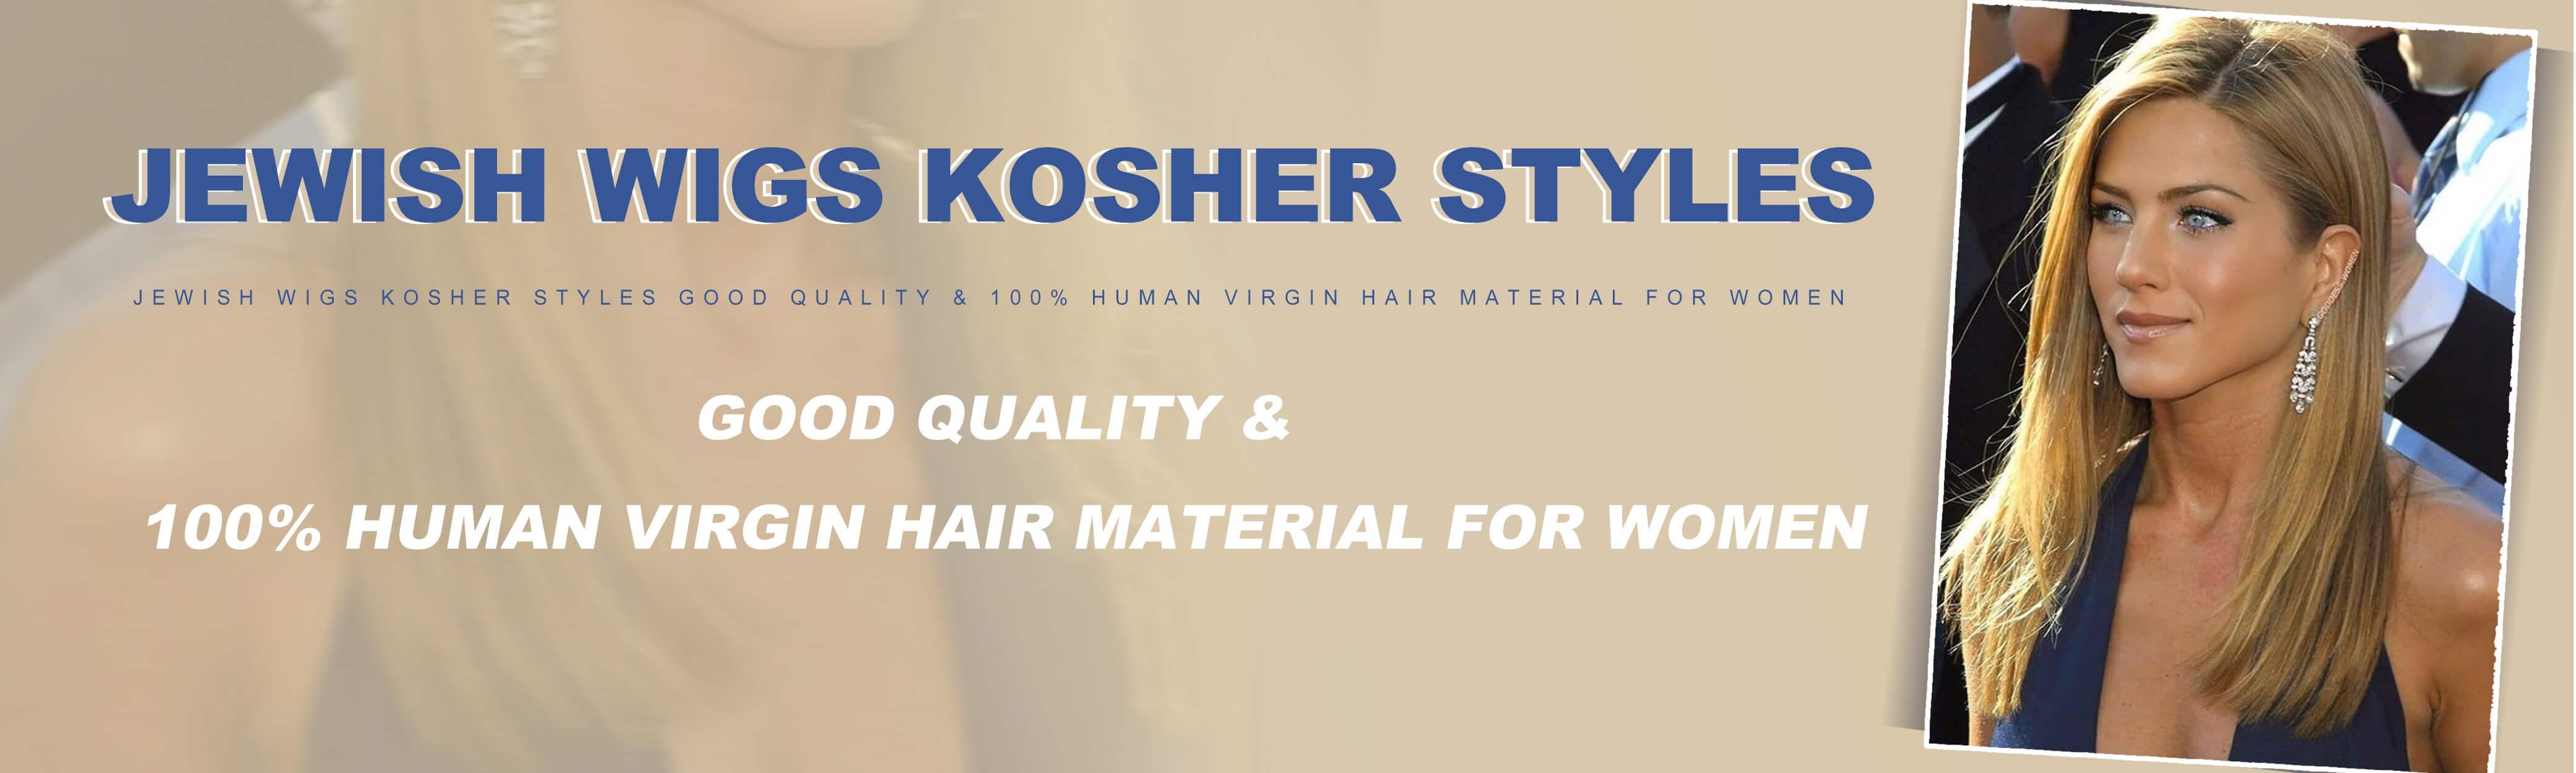 Jewish Wigs Kosher